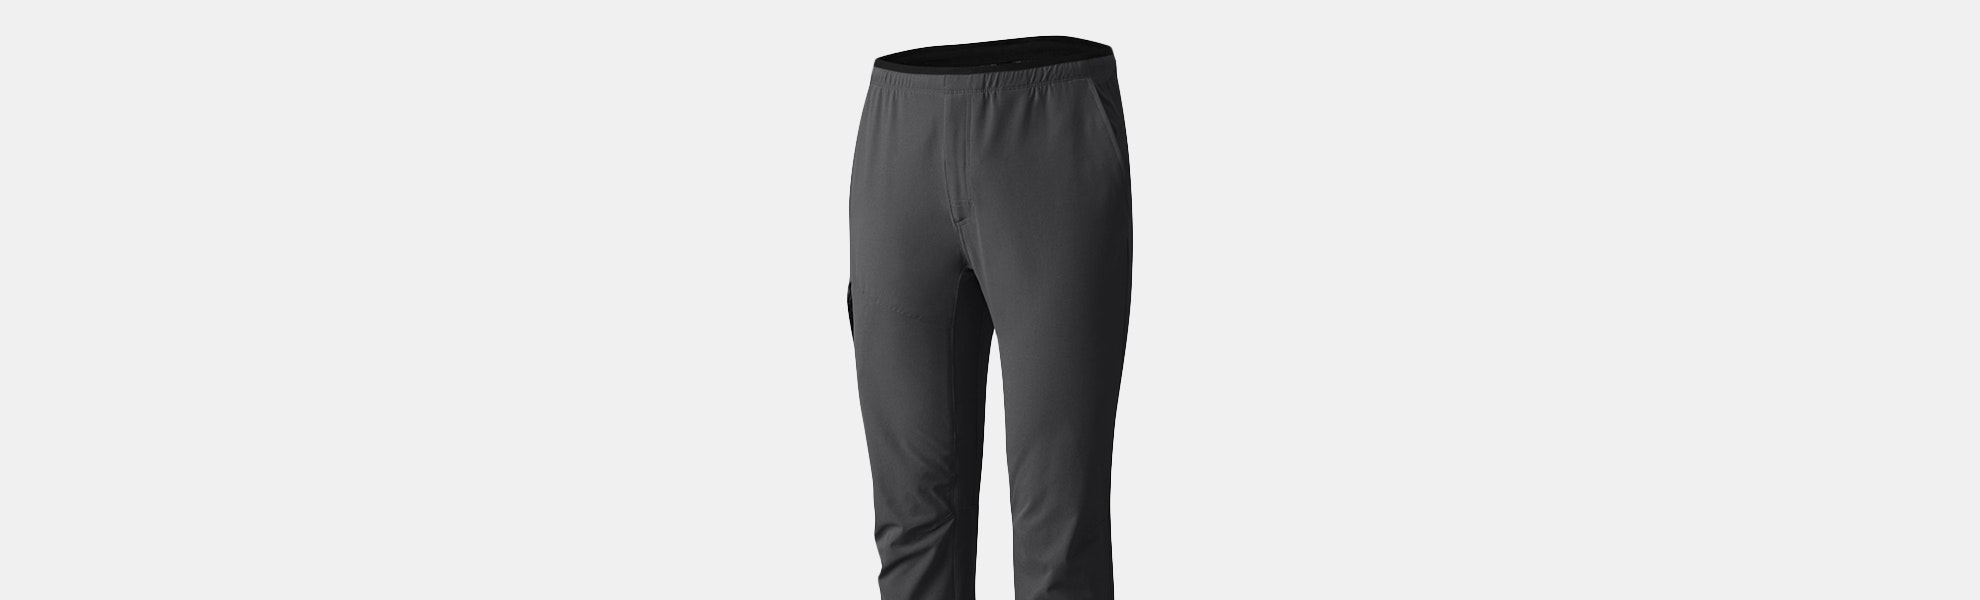 Mountain Hardwear Men's Right Bank Scrambler Pants